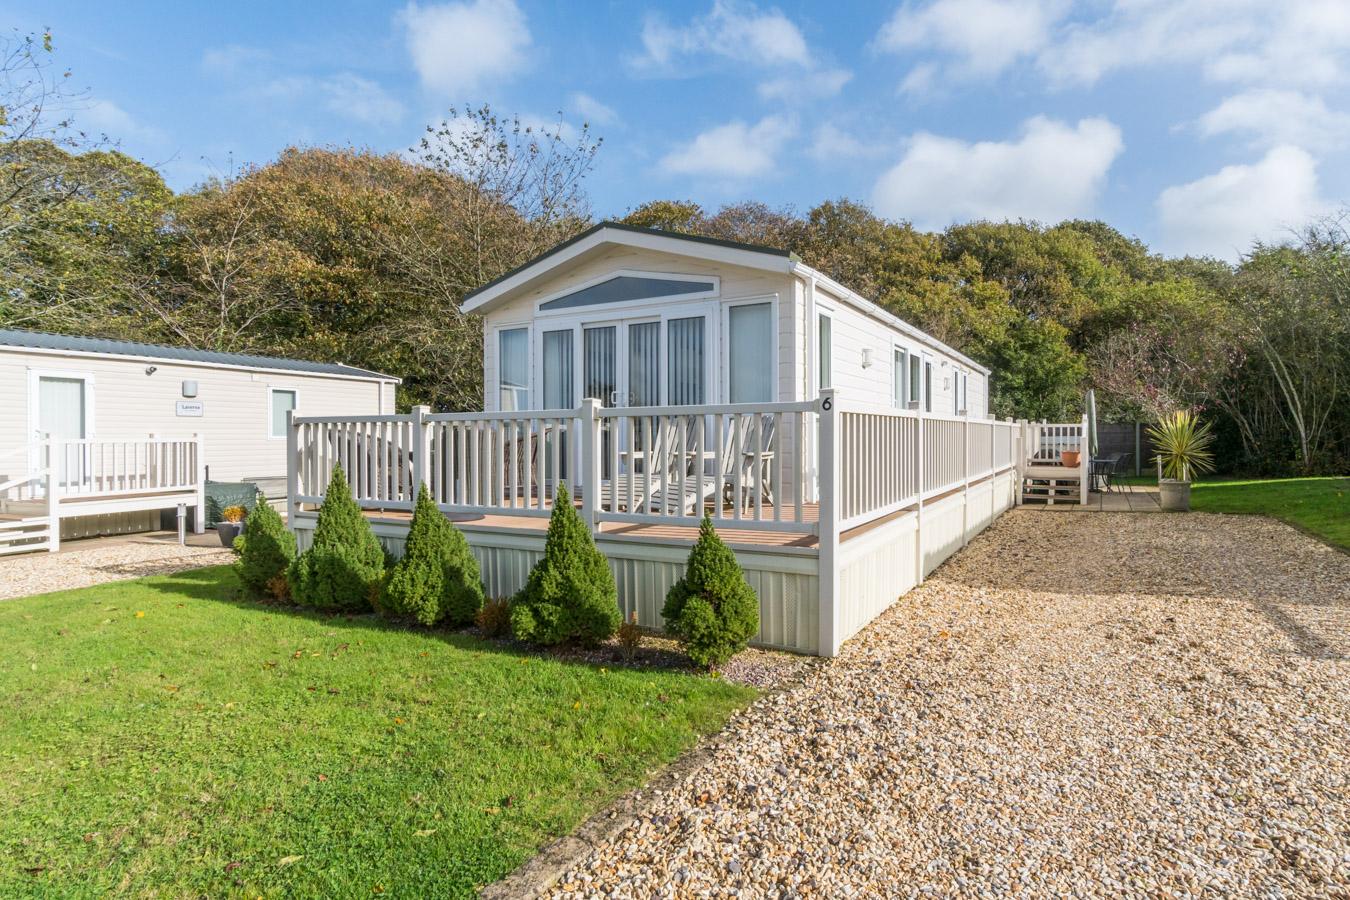 Neil-Bigwood-Monkton-Wyld-Holiday-Homes-41